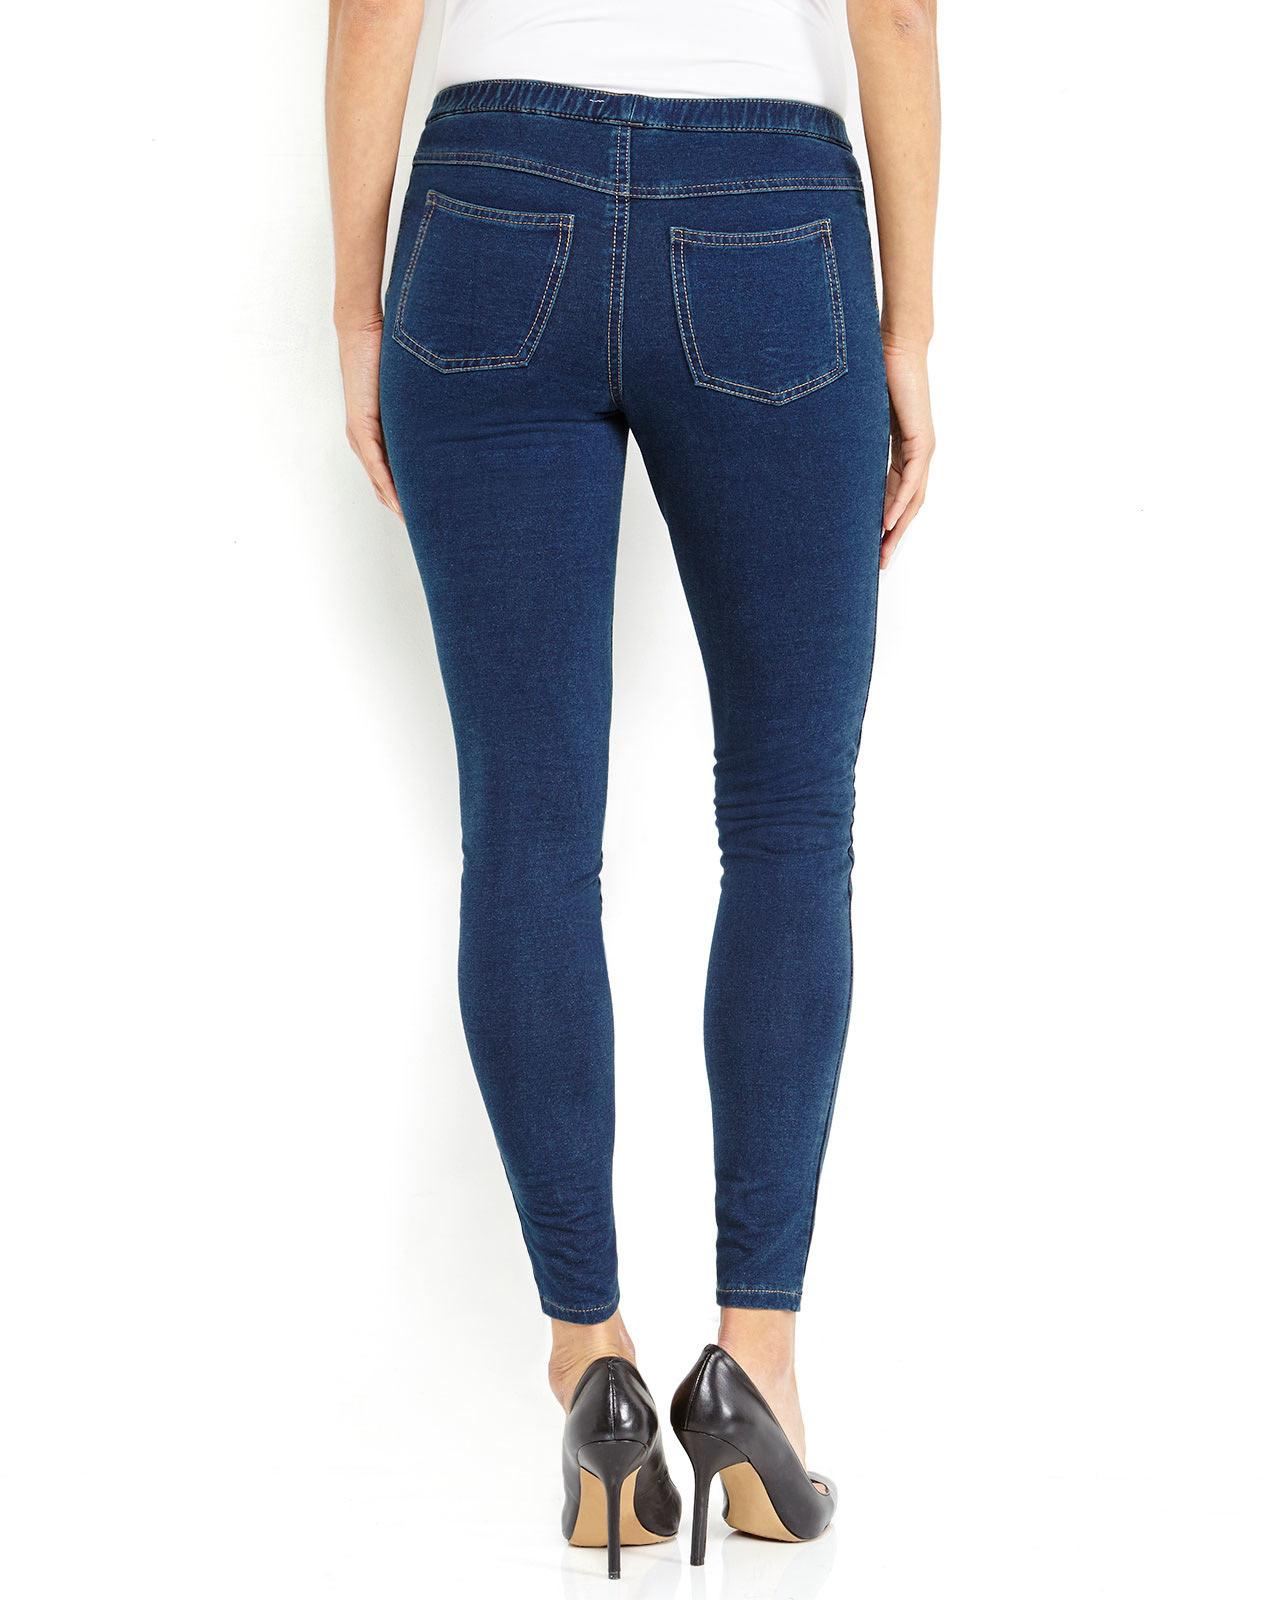 Hue Denim Leggings in Blue